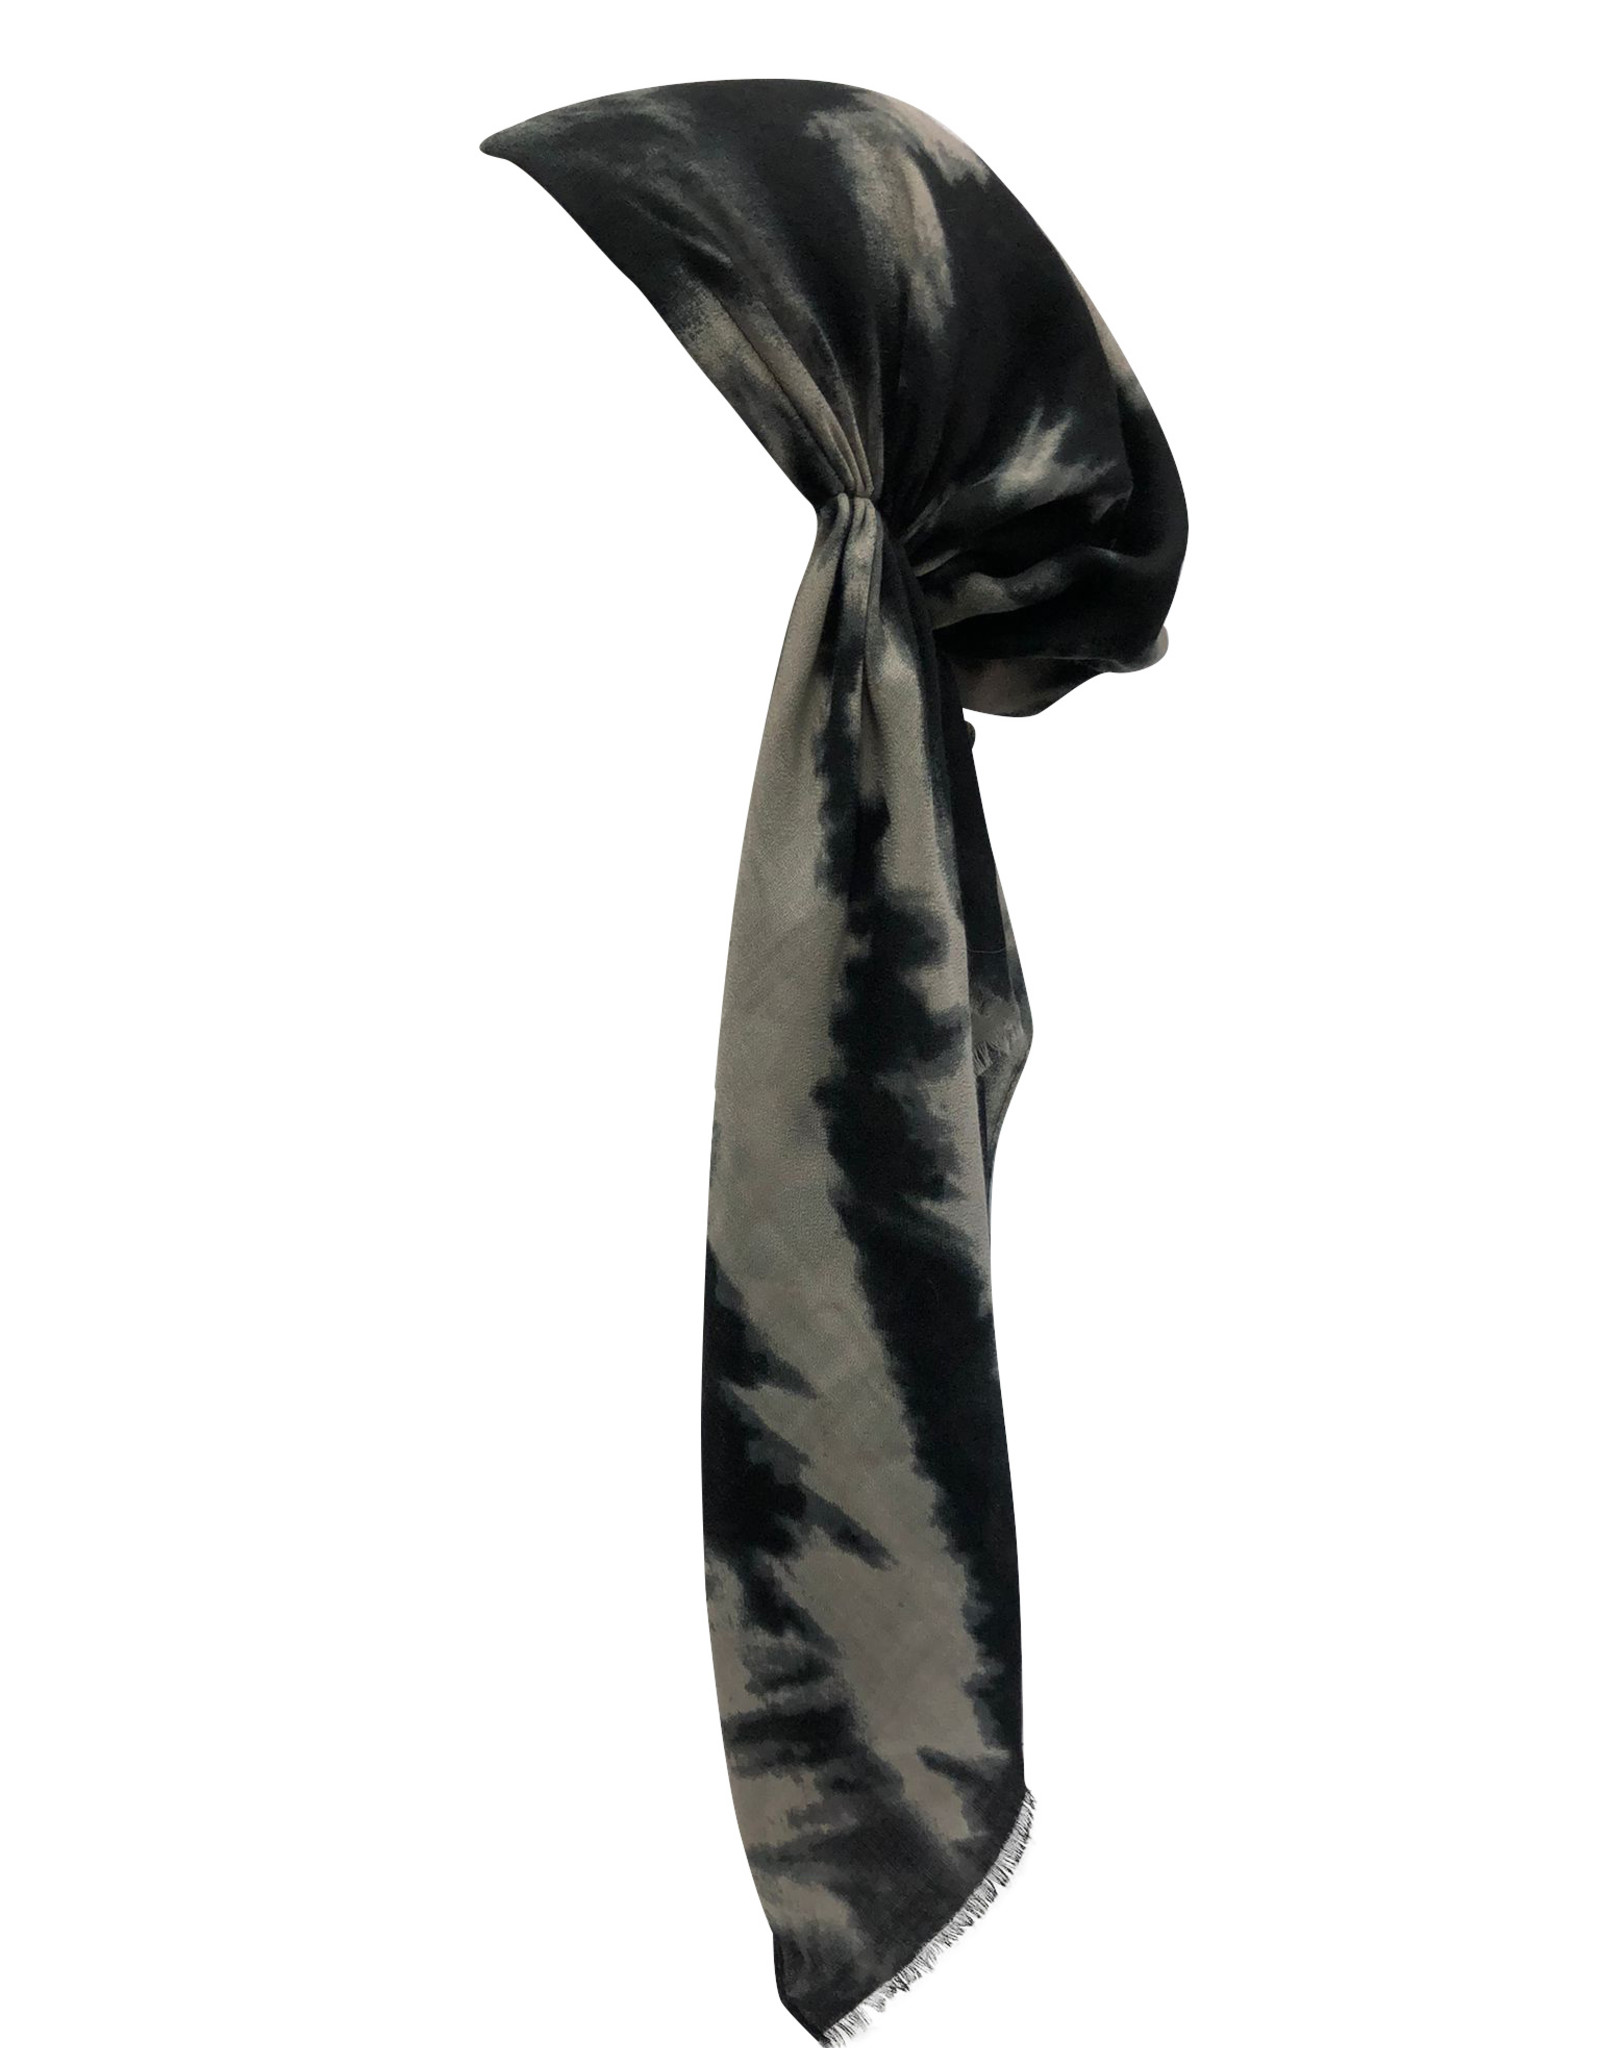 Dacee Dacee Winter TieDye Pre-Tied Headscarf with Velvet